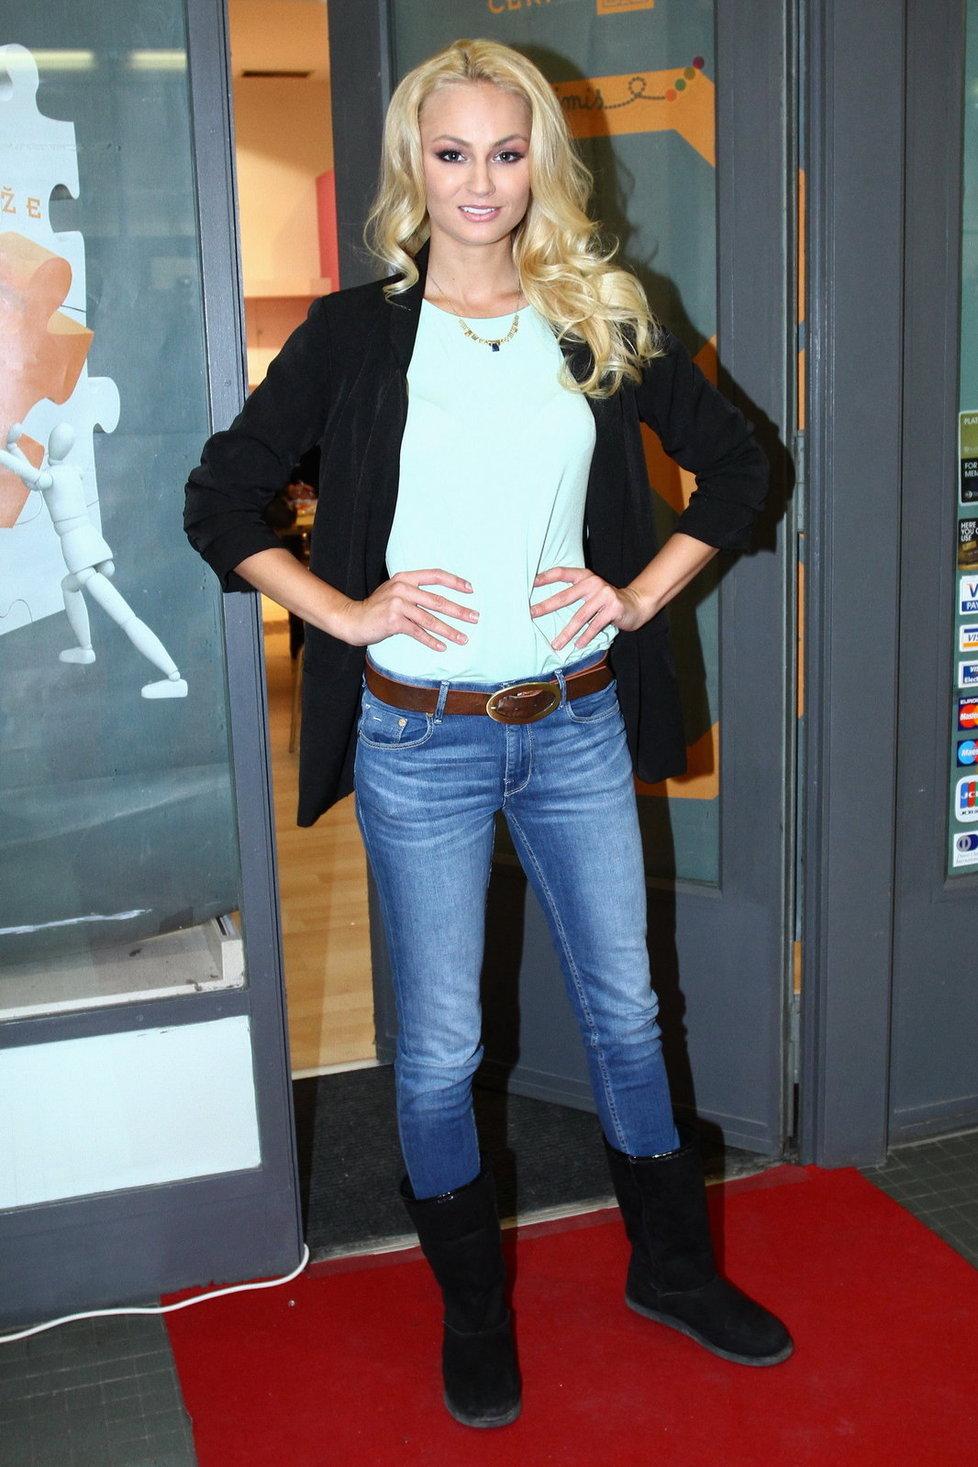 Tereza Fajksová - Tereza Fajksova- Miss Earth 2012 Official Thread (Czech Republic) - Page 3 1519143_